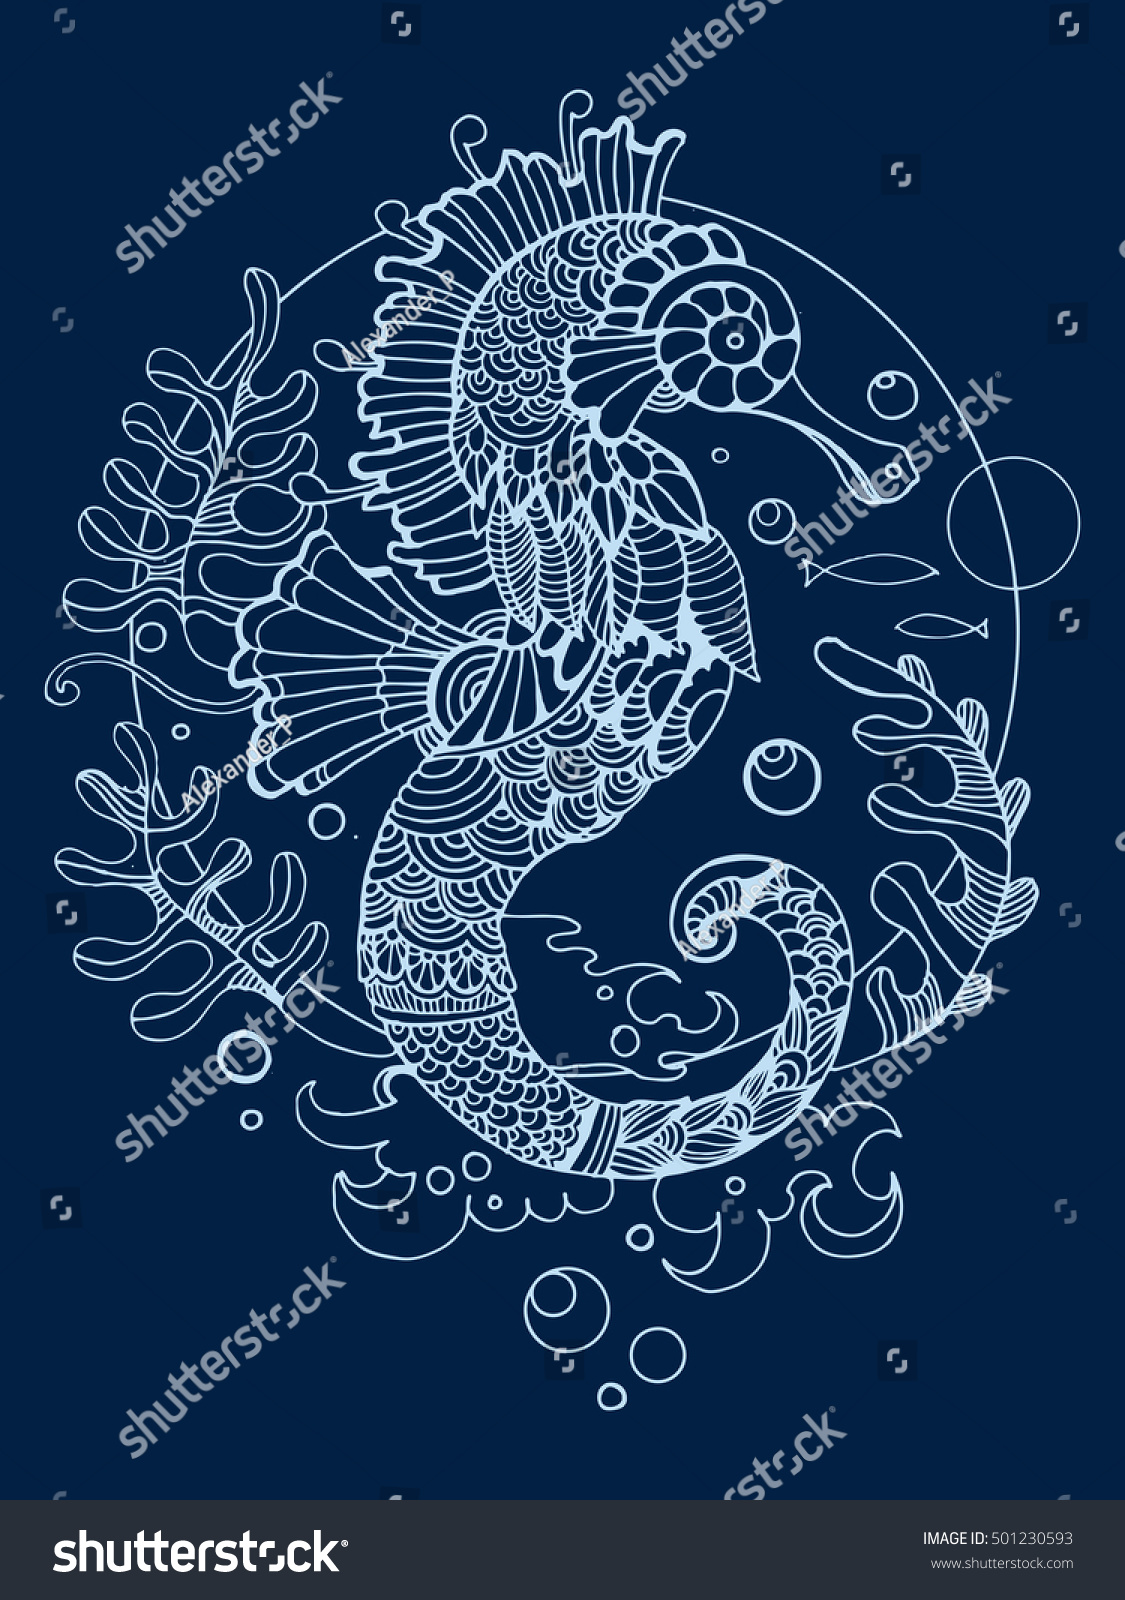 sea horse coloring book adults vector stock vector 501230593